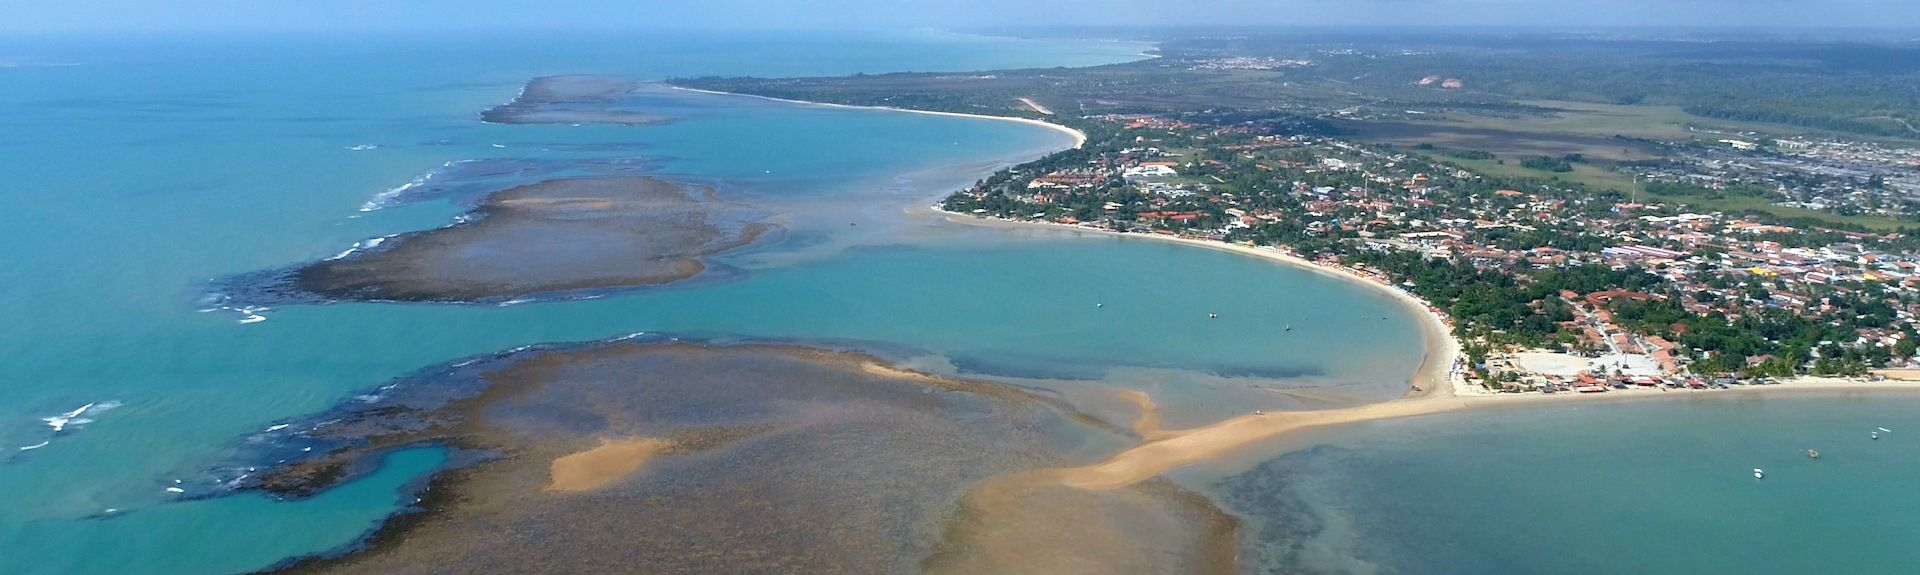 Complexo de Lazer Toa Toa, Porto Seguro Municipality, State of Bahia, BR